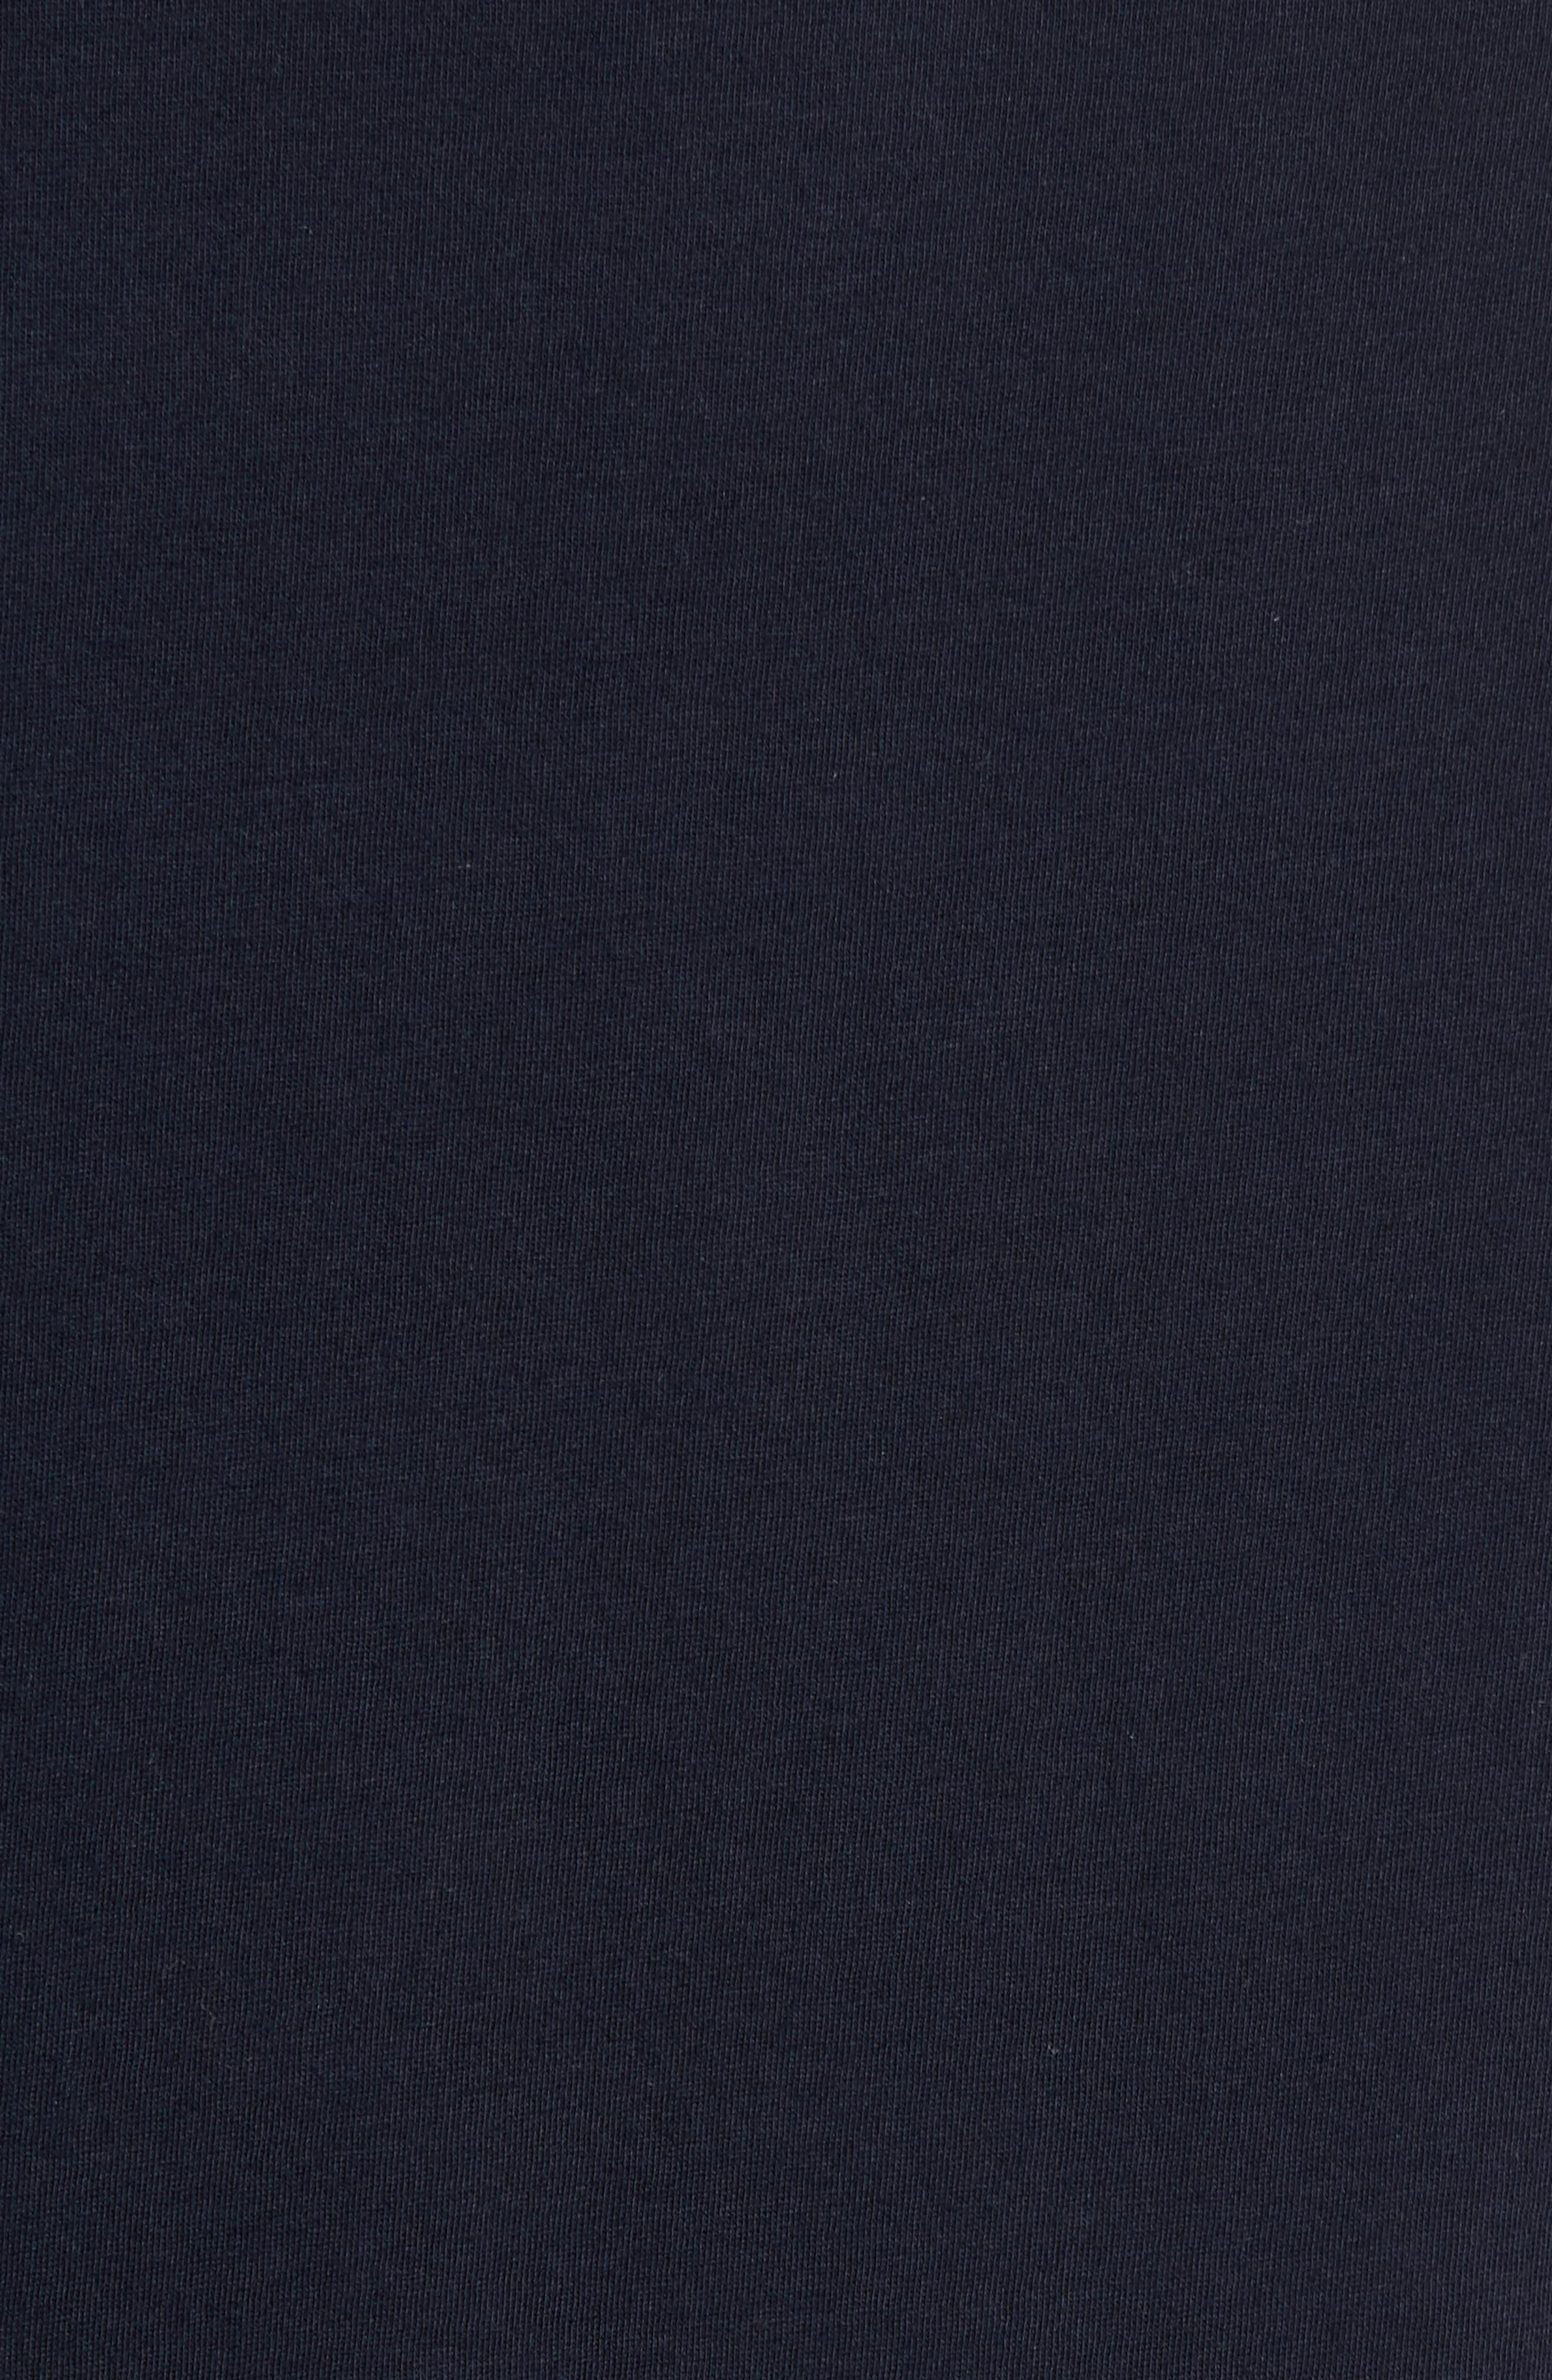 Henley T-Shirt,                             Alternate thumbnail 5, color,                             Marine Blue